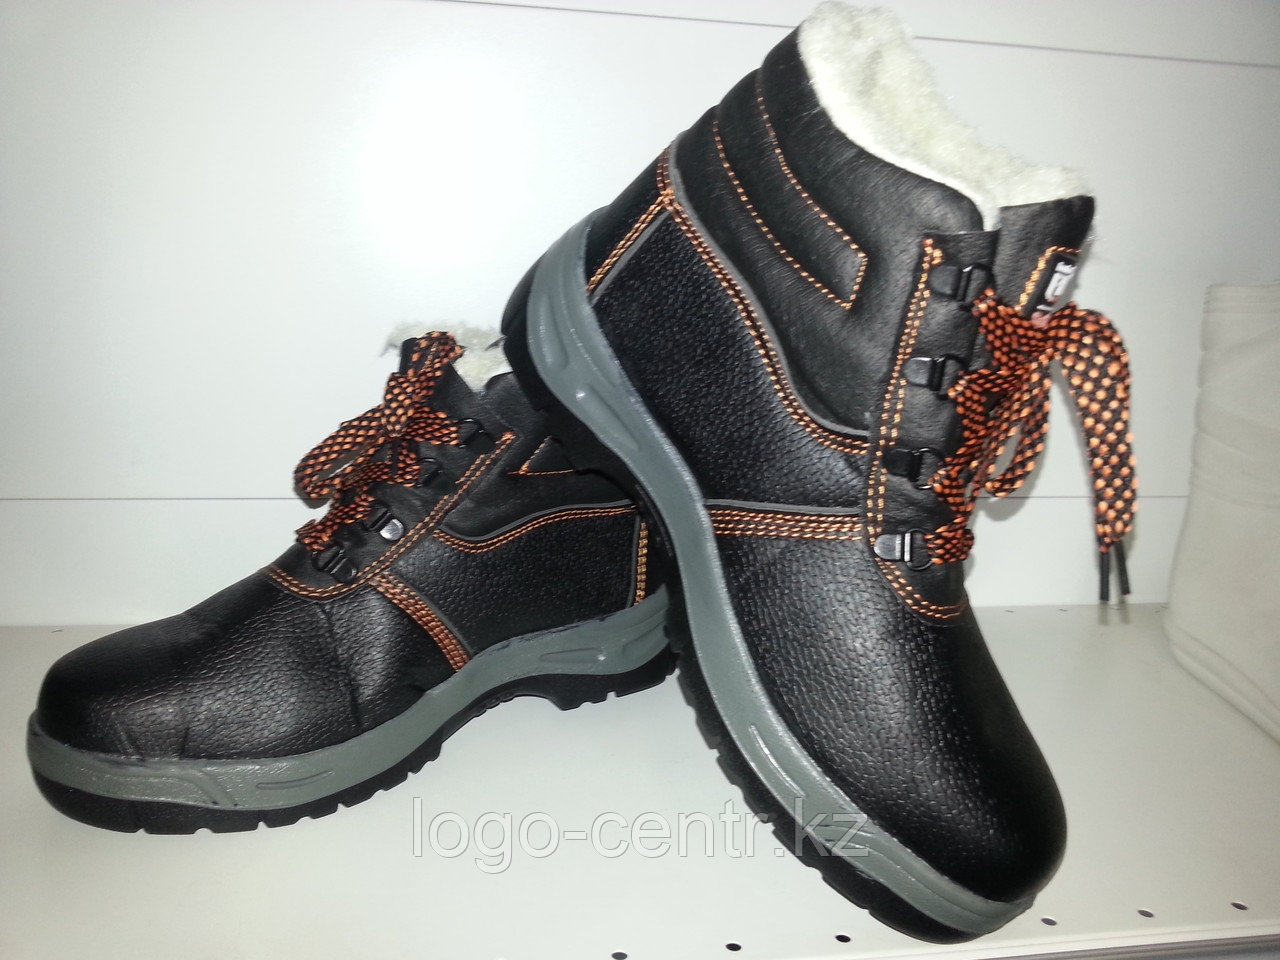 Ботинки АНТЕНГ зимние,арт 0080